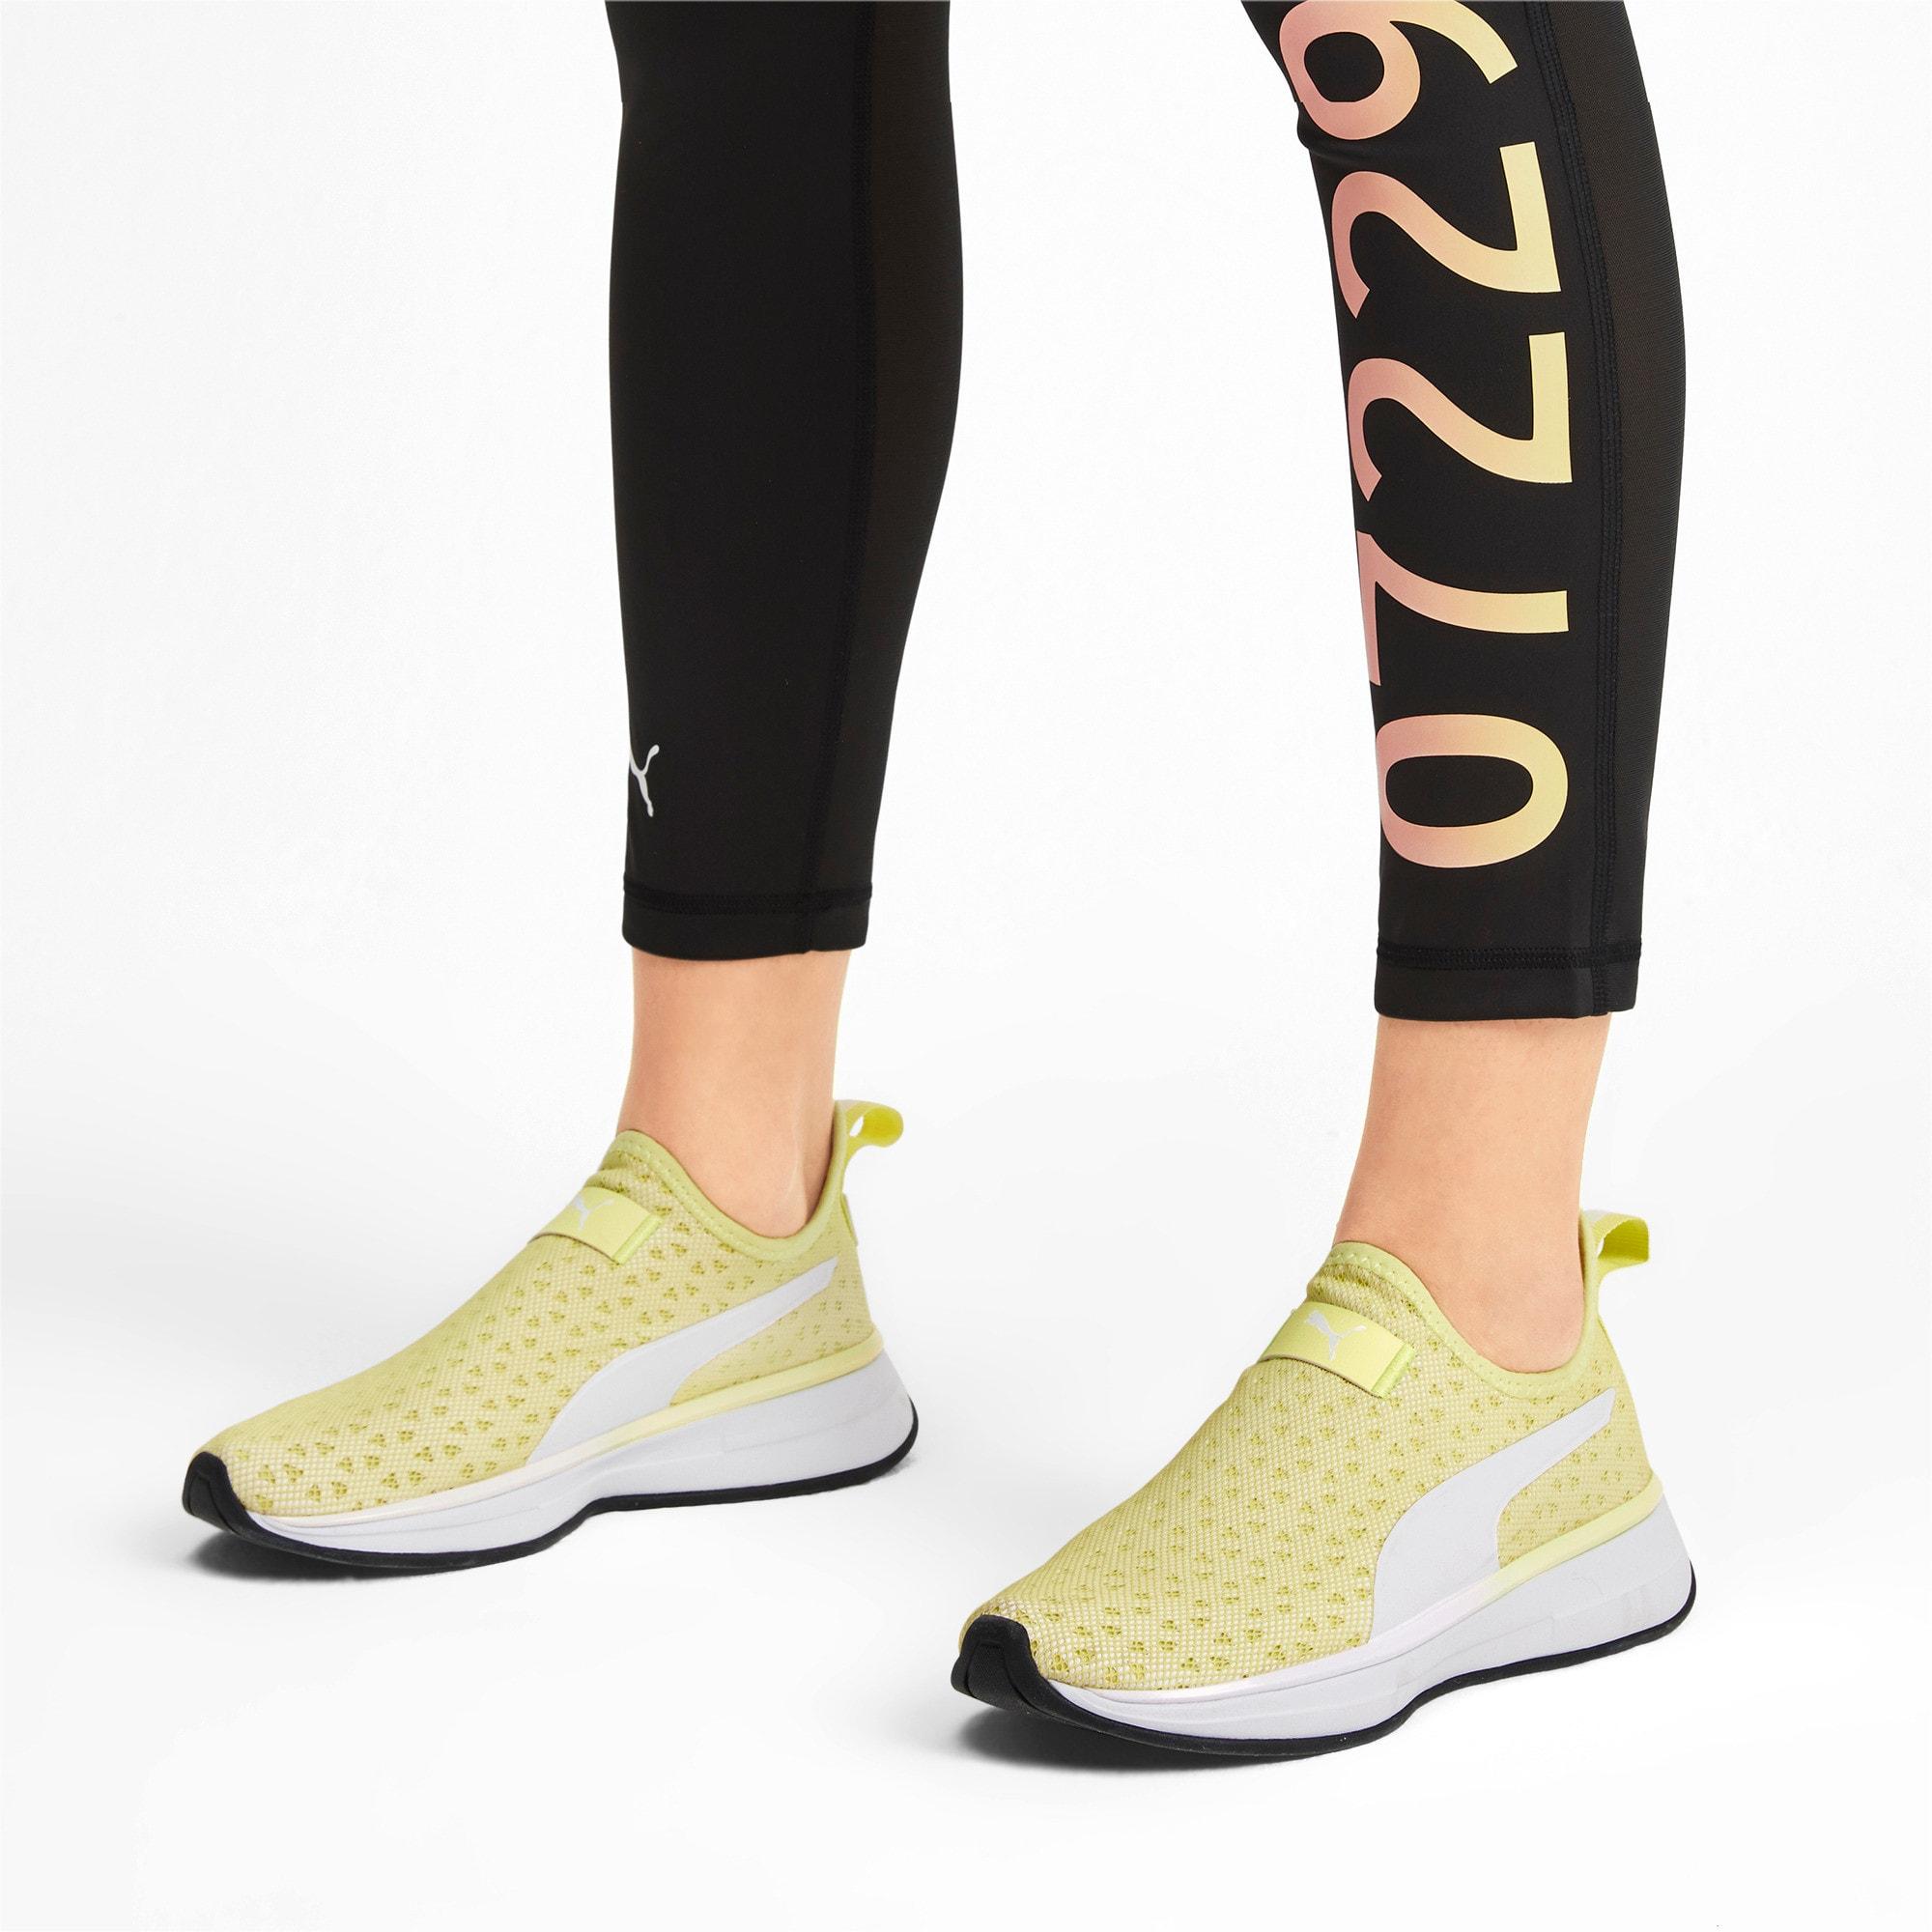 Thumbnail 2 of PUMA x SELENA GOMEZ Slip-On Women's Training Shoes, YELLOW-Puma White-Puma Black, medium